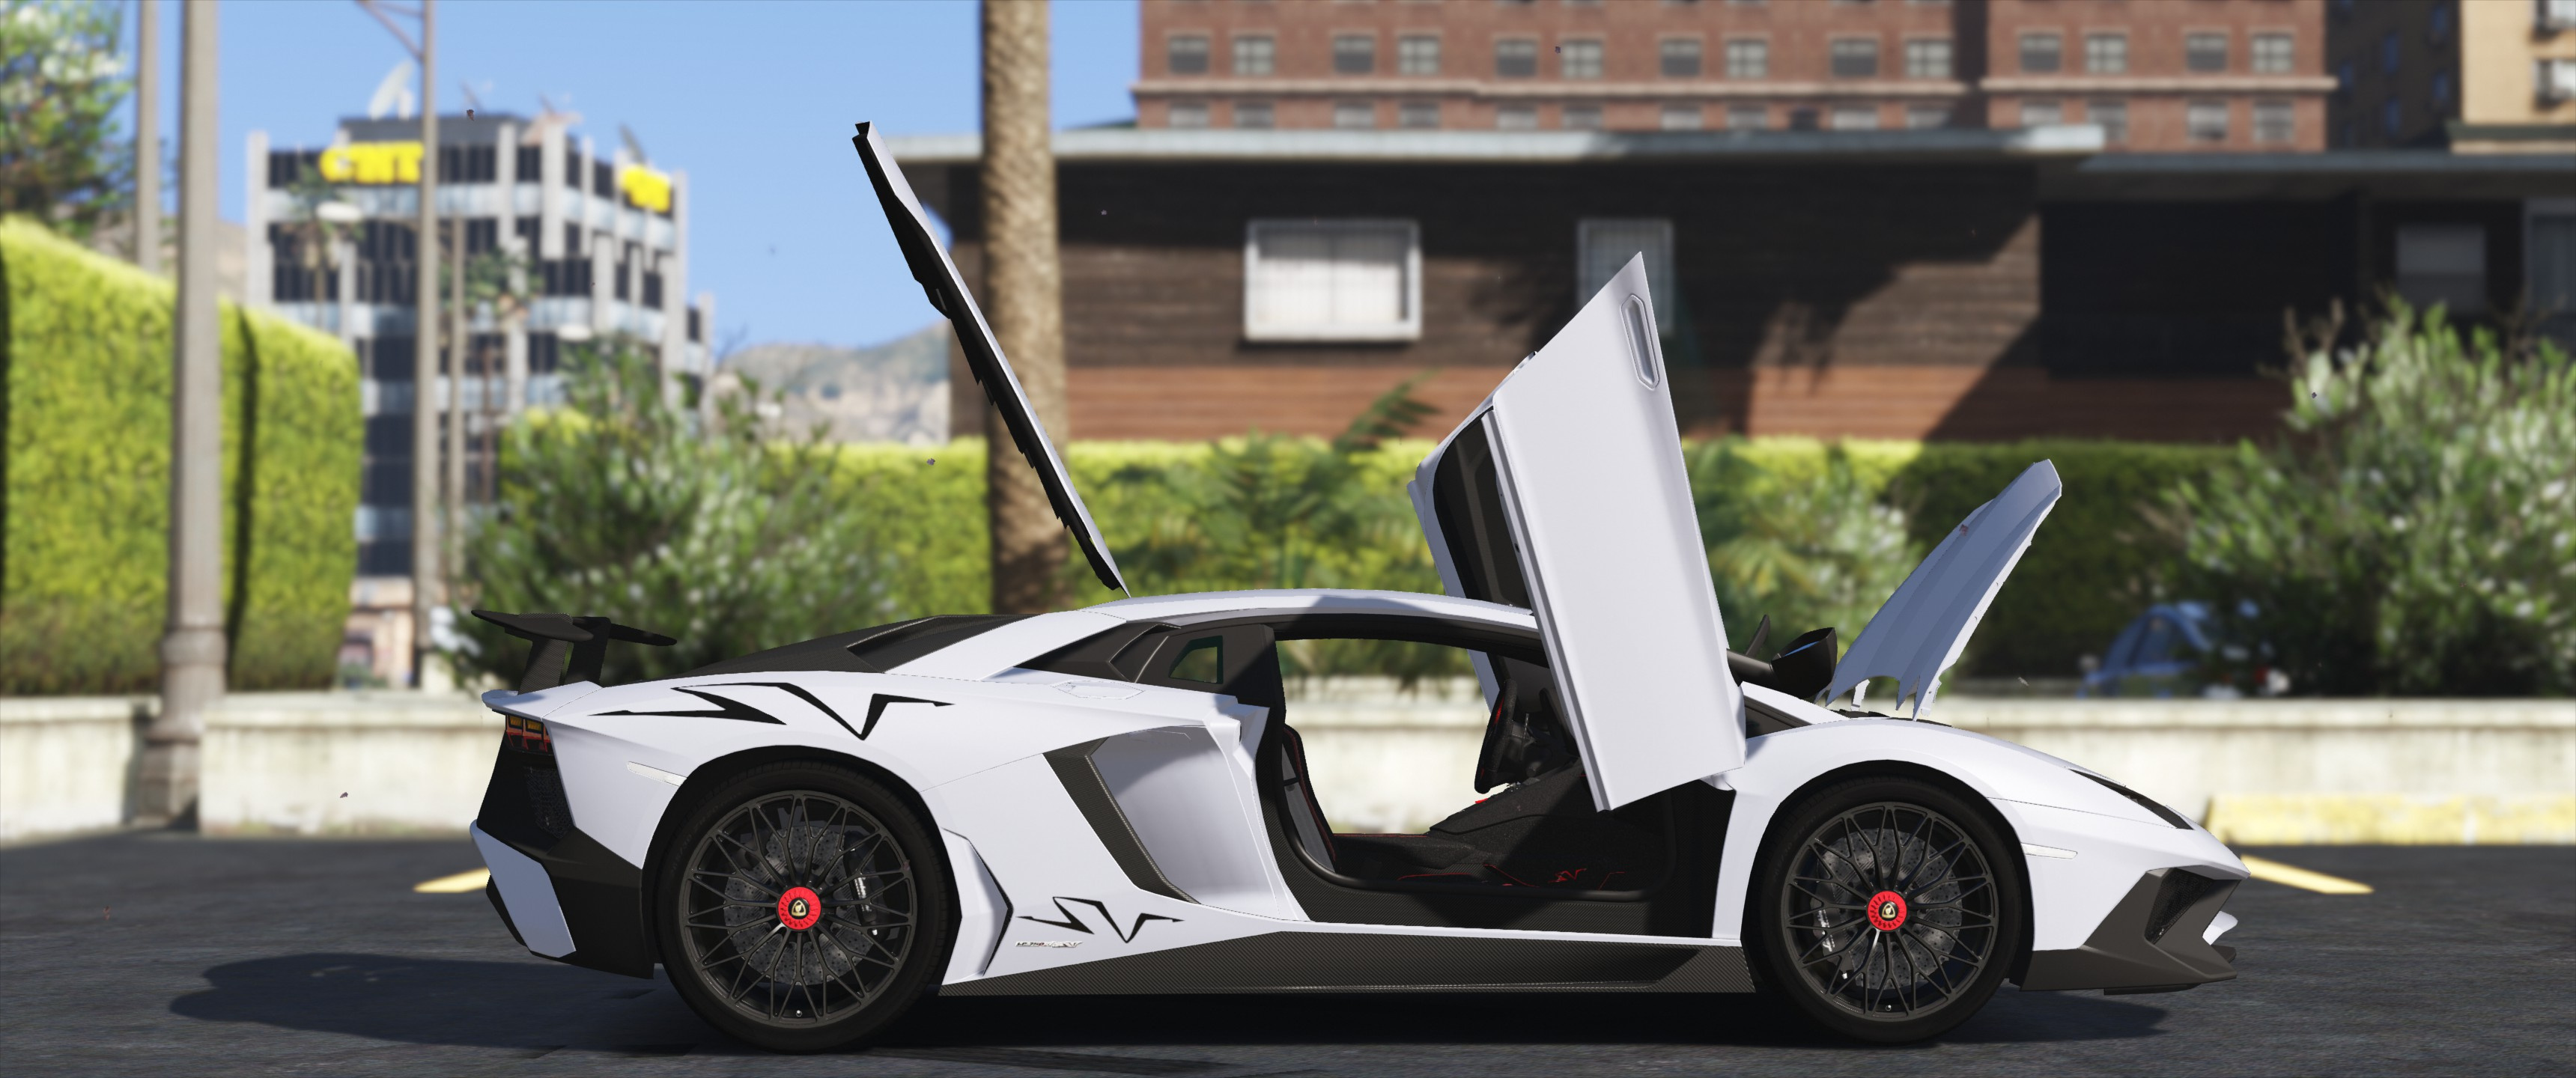 Lamborghini Aventador Lp 750 4 Sv 15 Add On Gta5 Mods Com